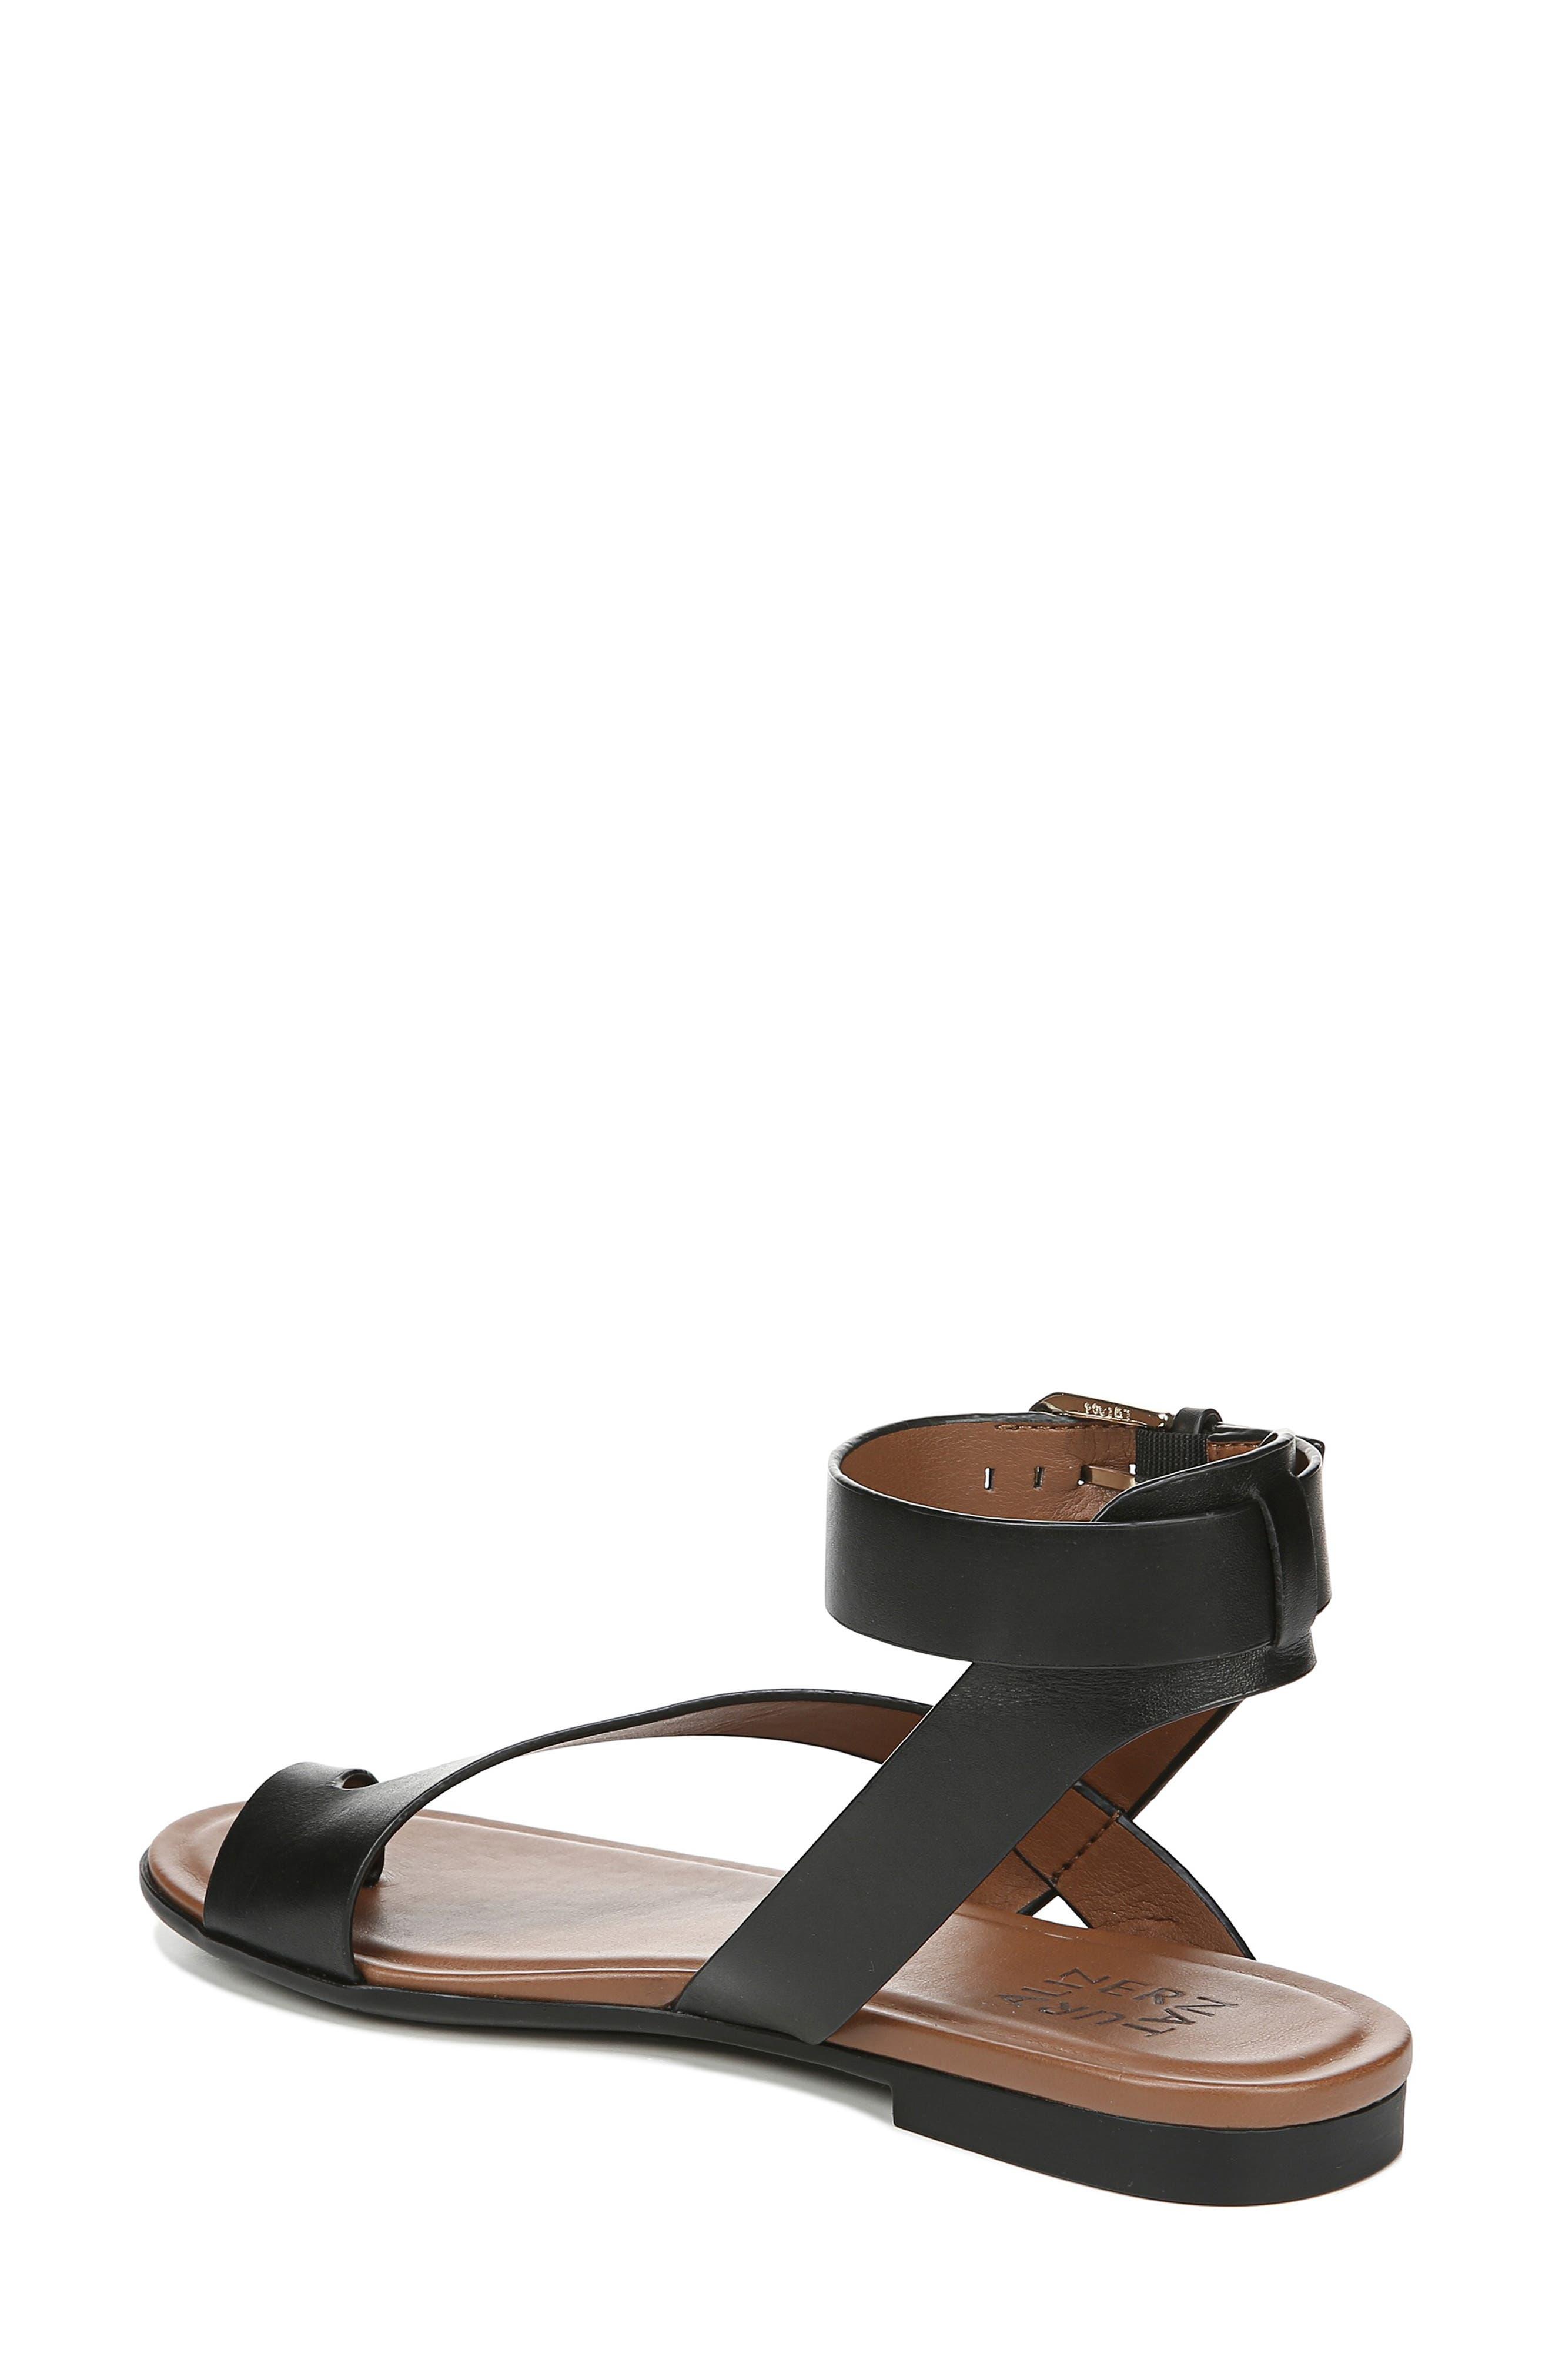 Tally Ankle Strap Sandal,                             Alternate thumbnail 2, color,                             BLACK LEATHER